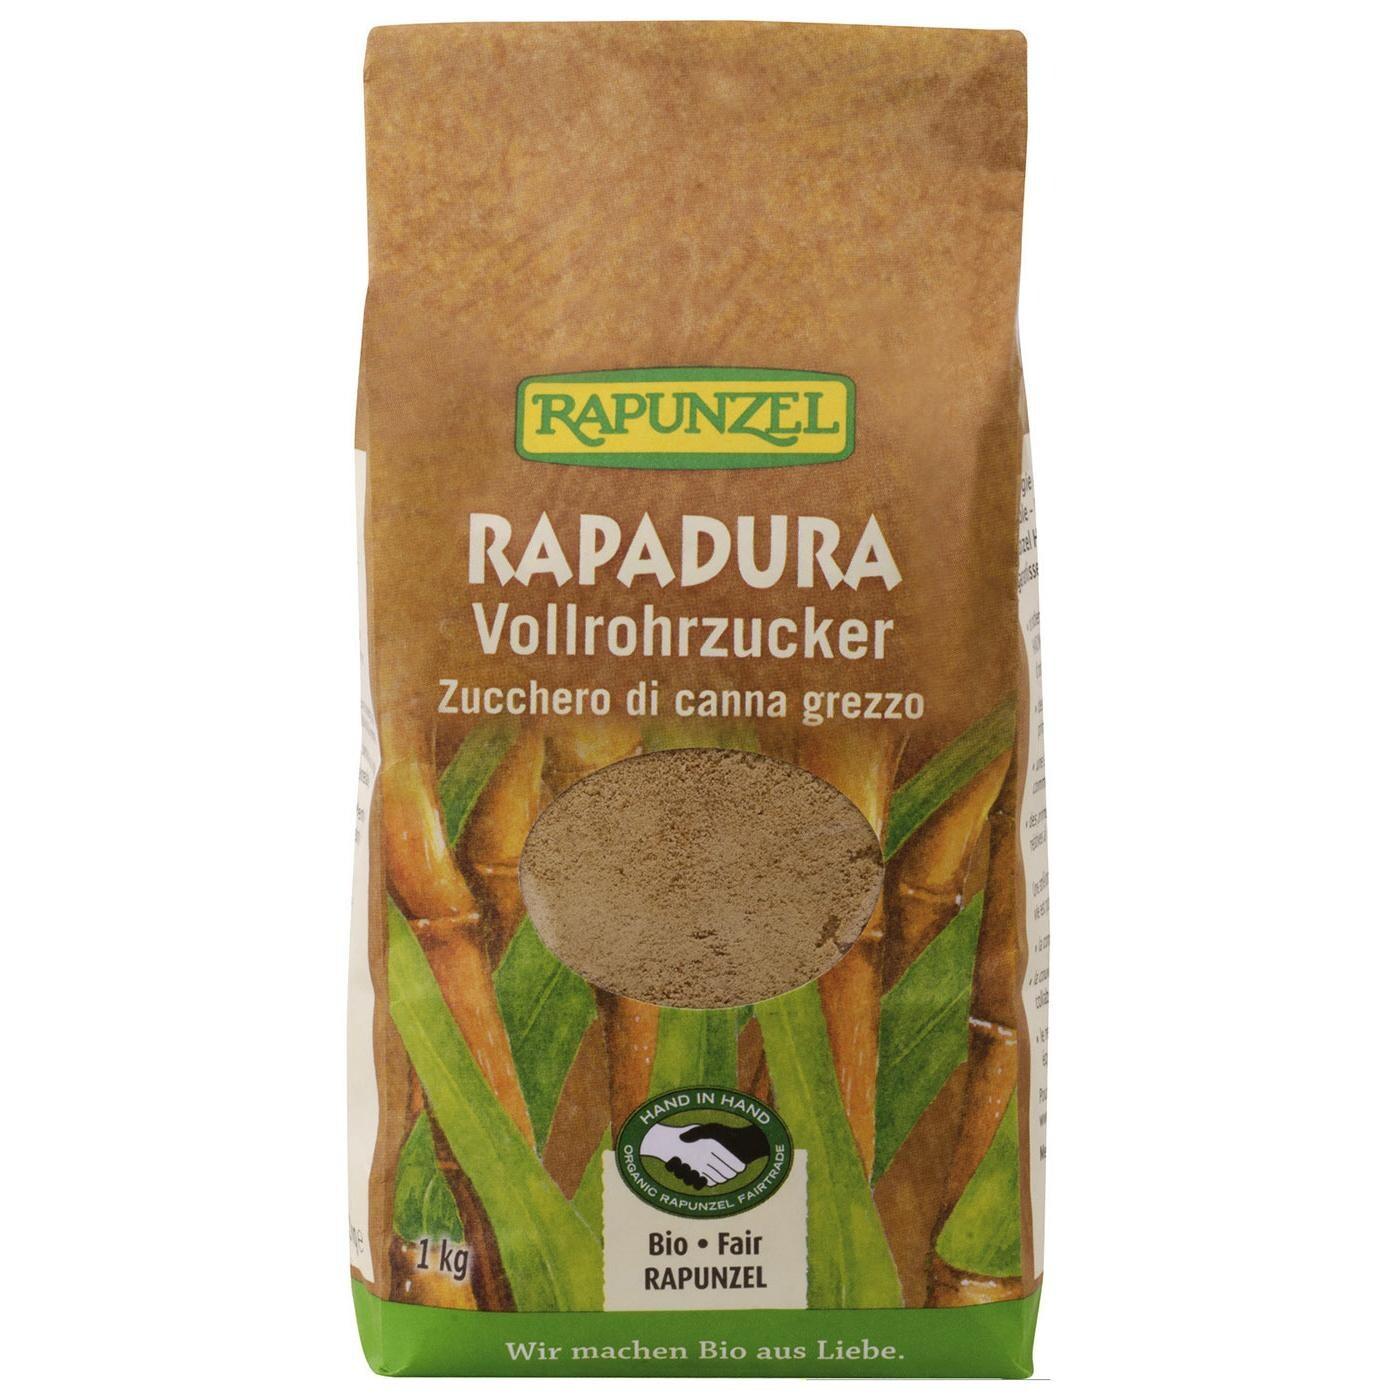 Rapunzel Bio Rapadura Vollrohrzucker 1 kg